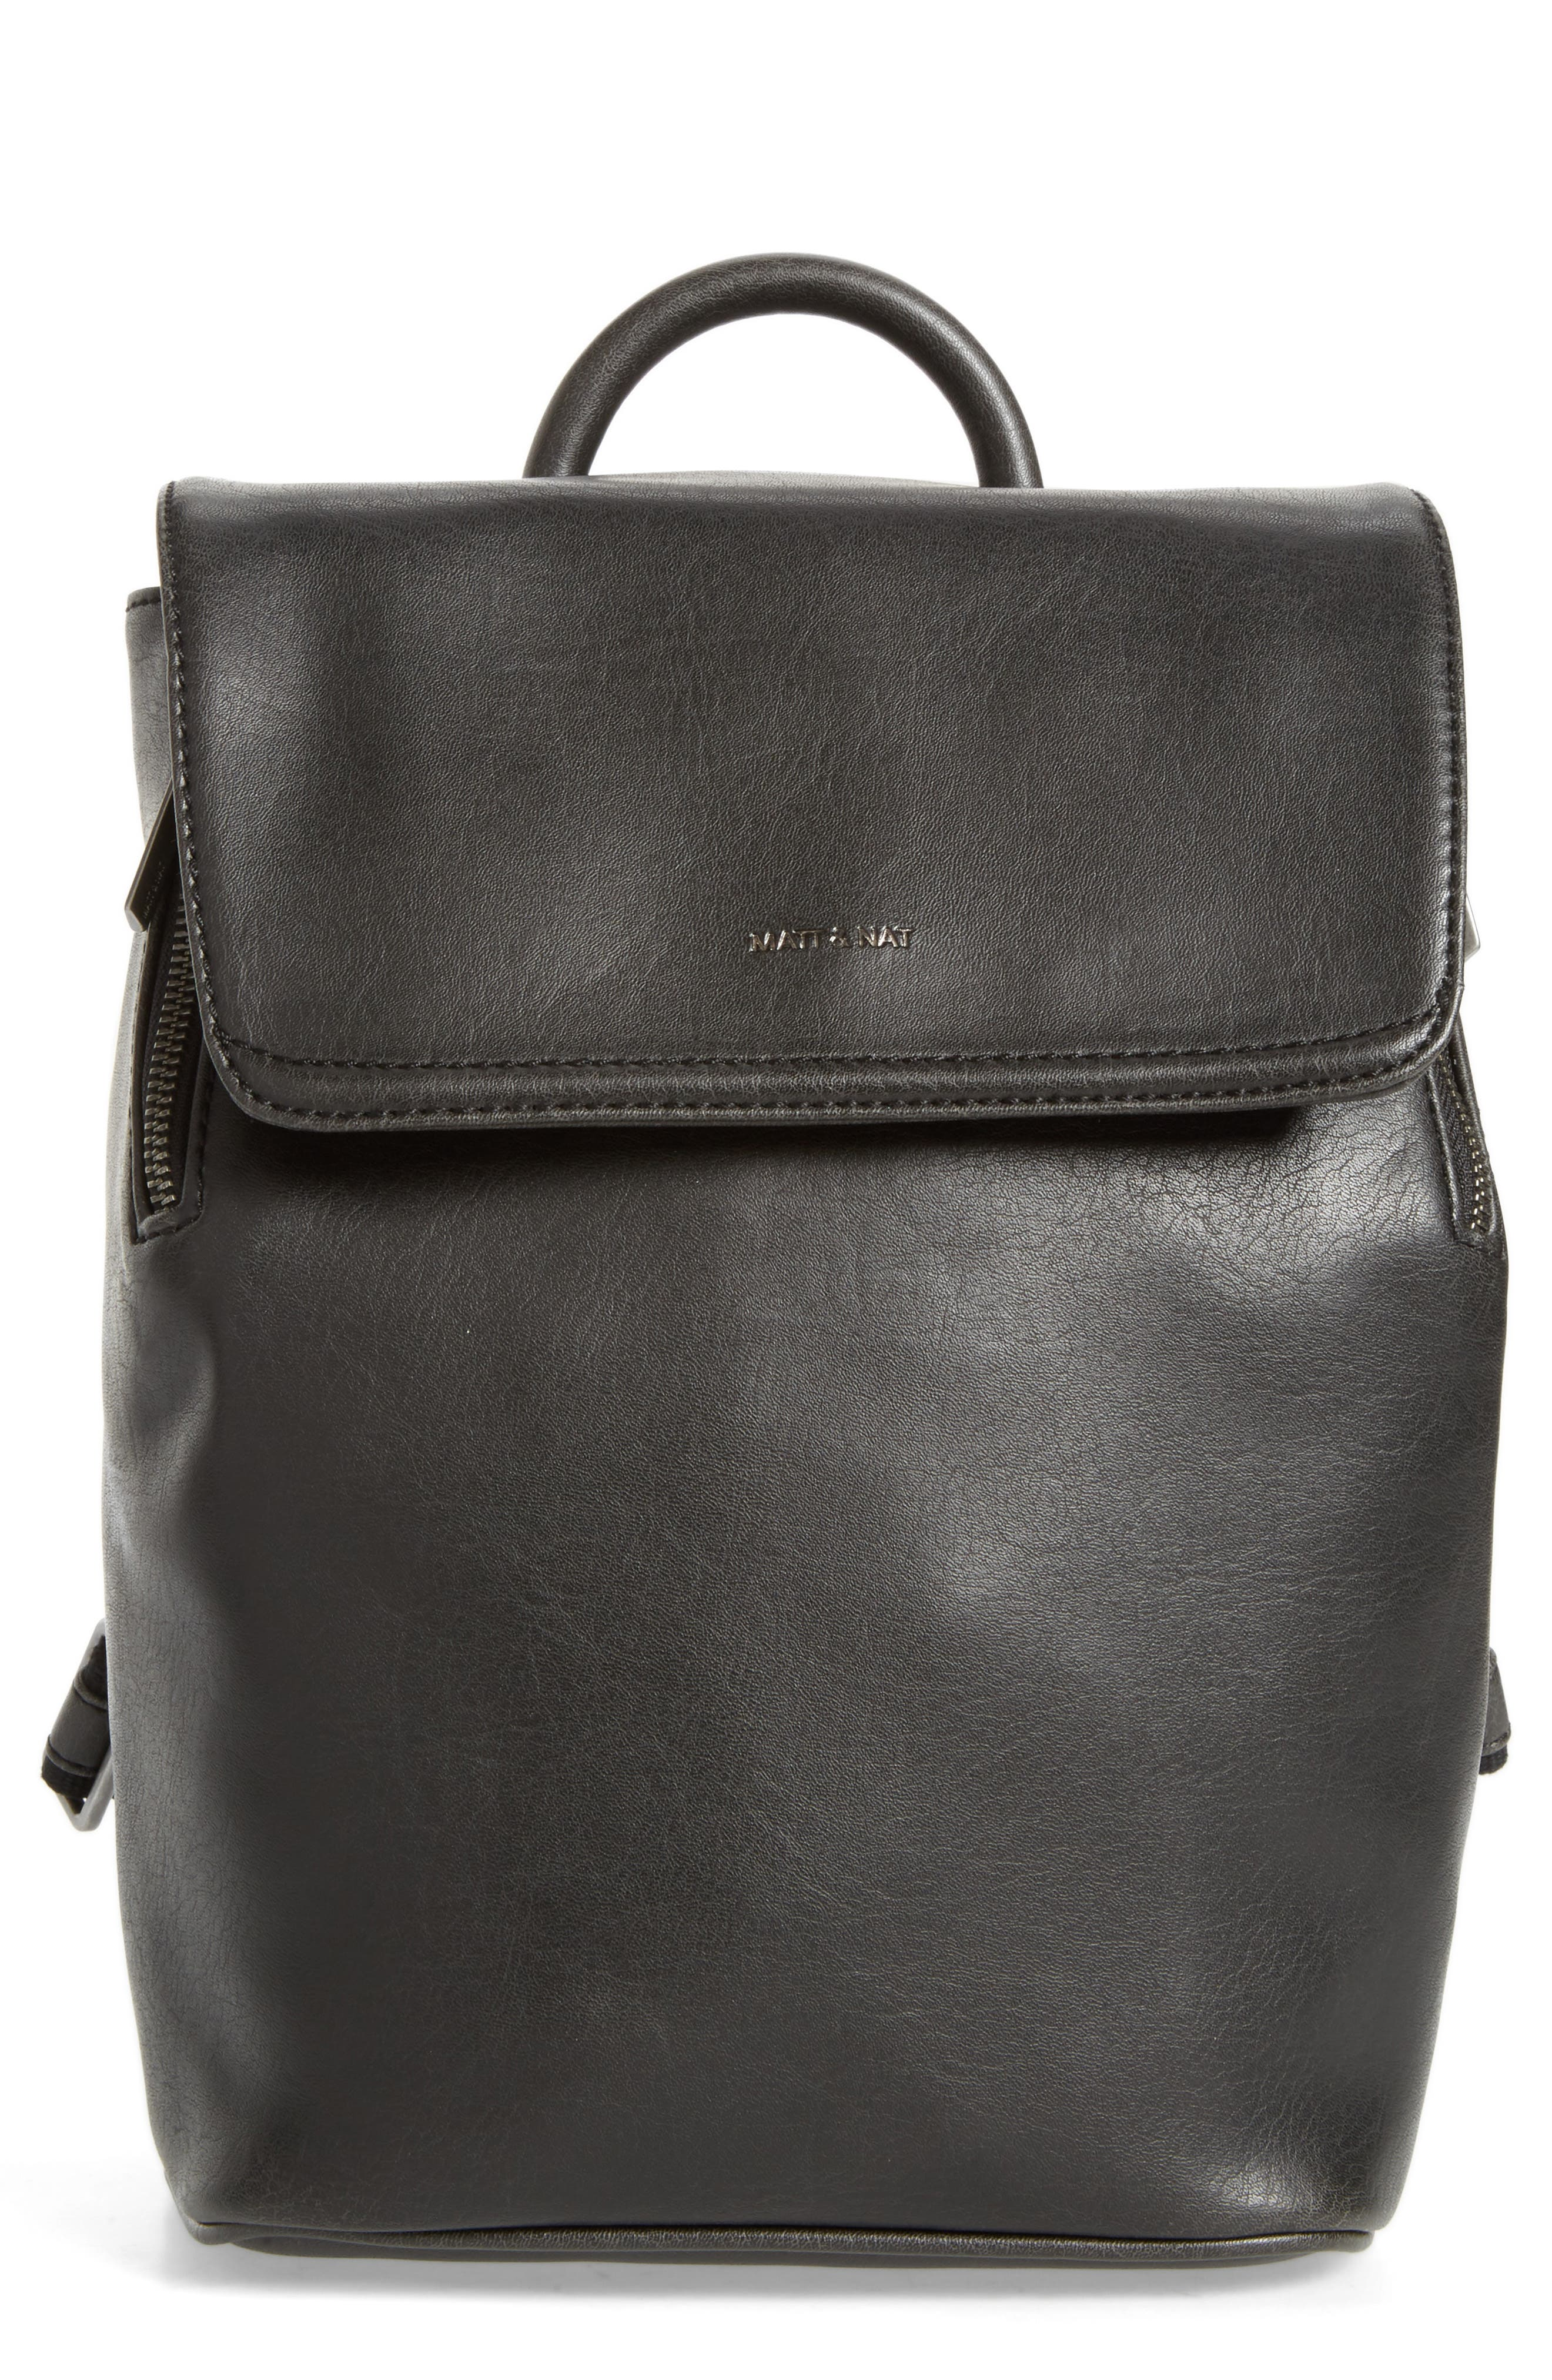 Matt & Nat Mini Fabi Faux Leather Backpack - Black